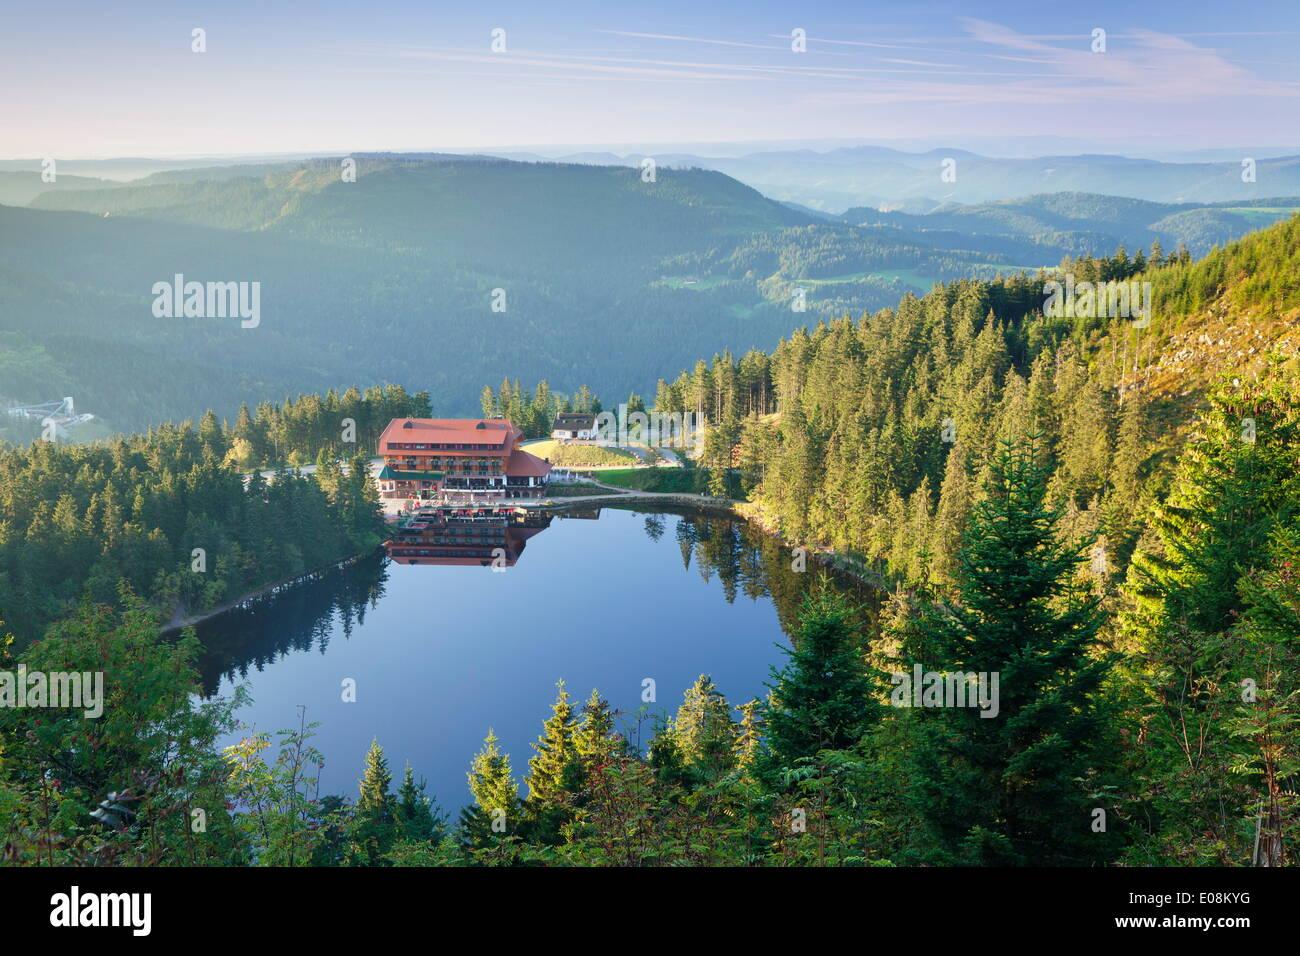 Mummelsee lake black forest baden wurttemberg germany europe stock photo royalty free image - Mobelhauser baden wurttemberg ...